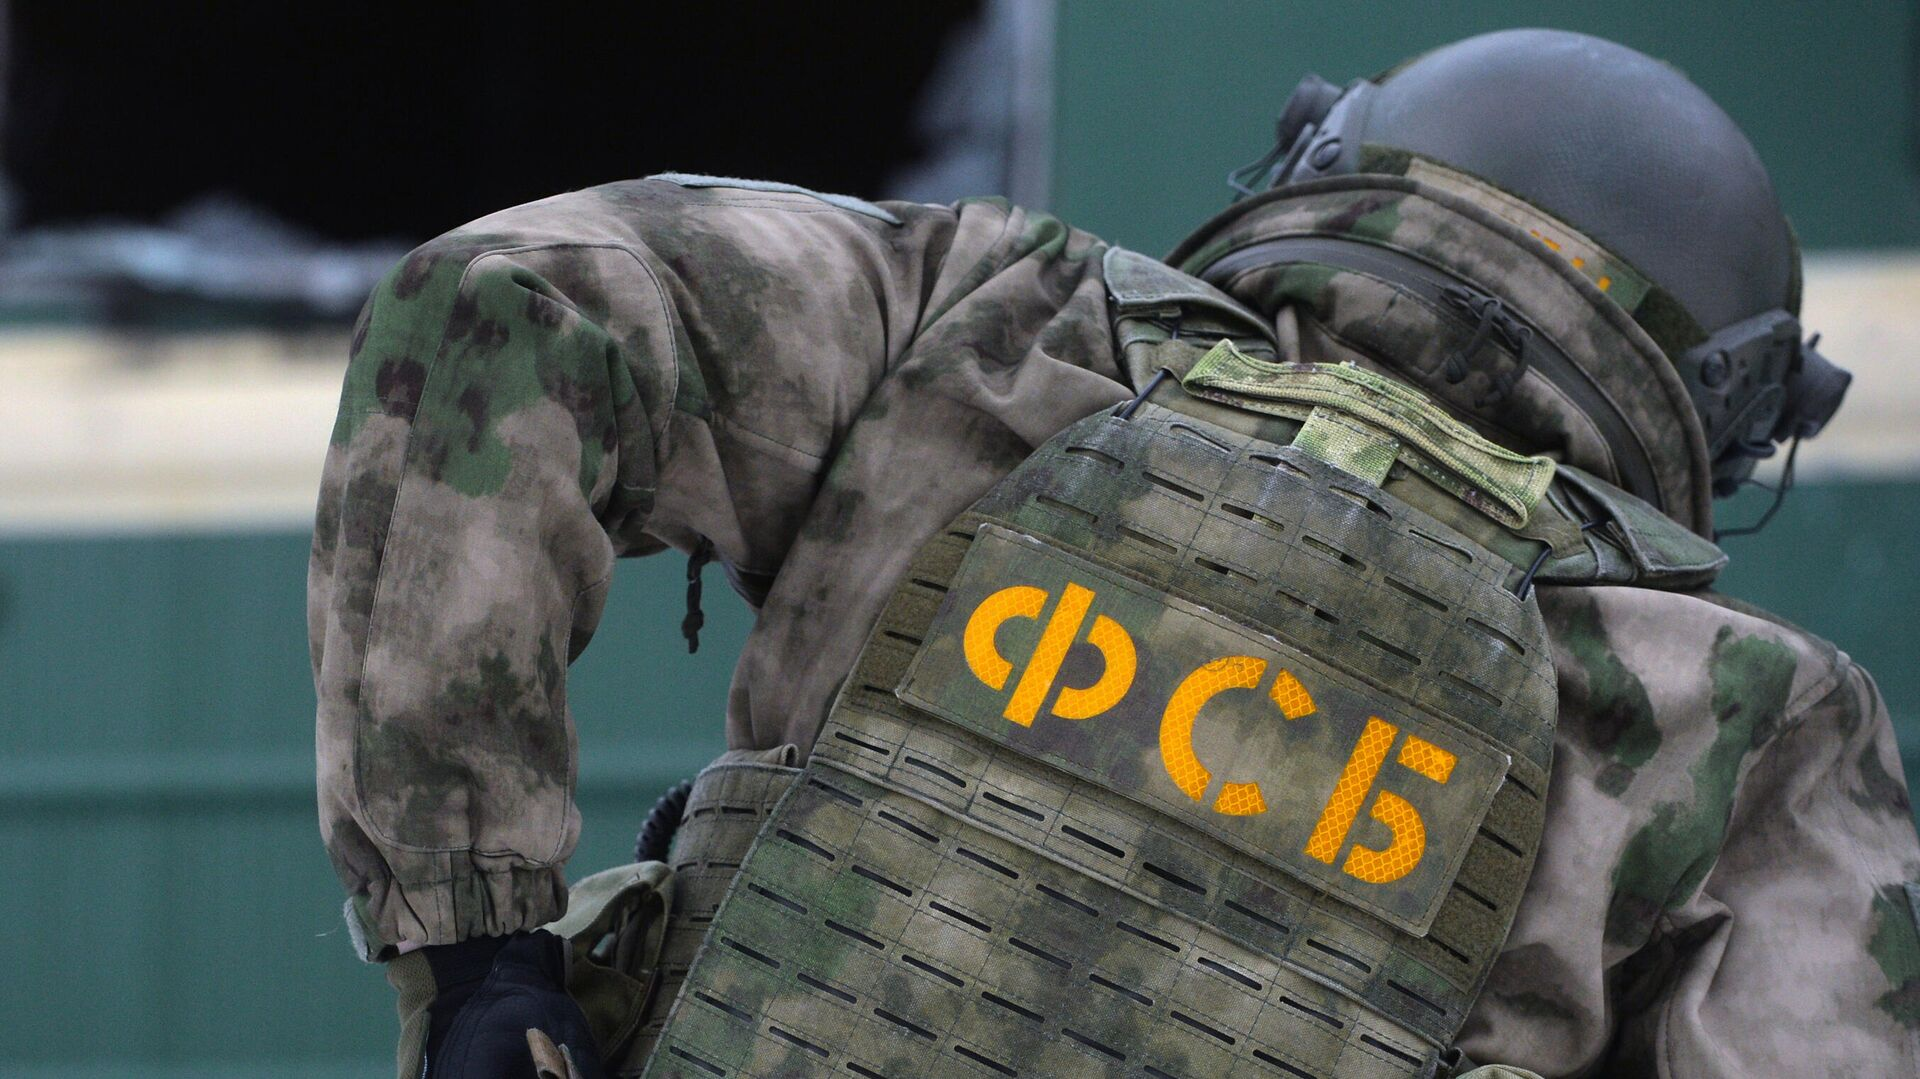 Сотрудник ФСБ - РИА Новости, 1920, 04.08.2021